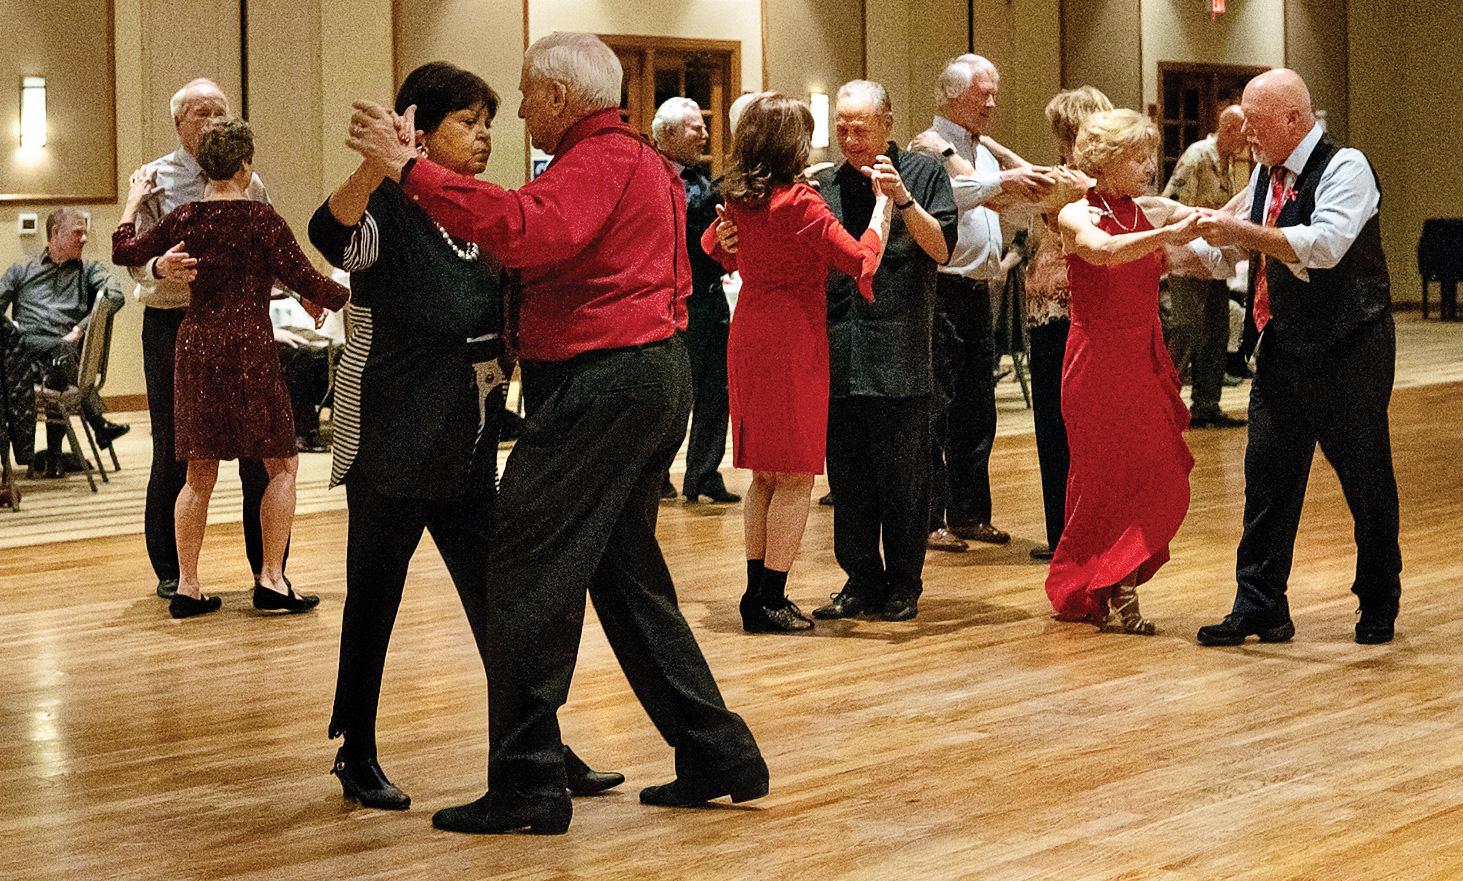 Dancers enjoying a SBDC Dinner Dance. (Photo by Sheila Honey)